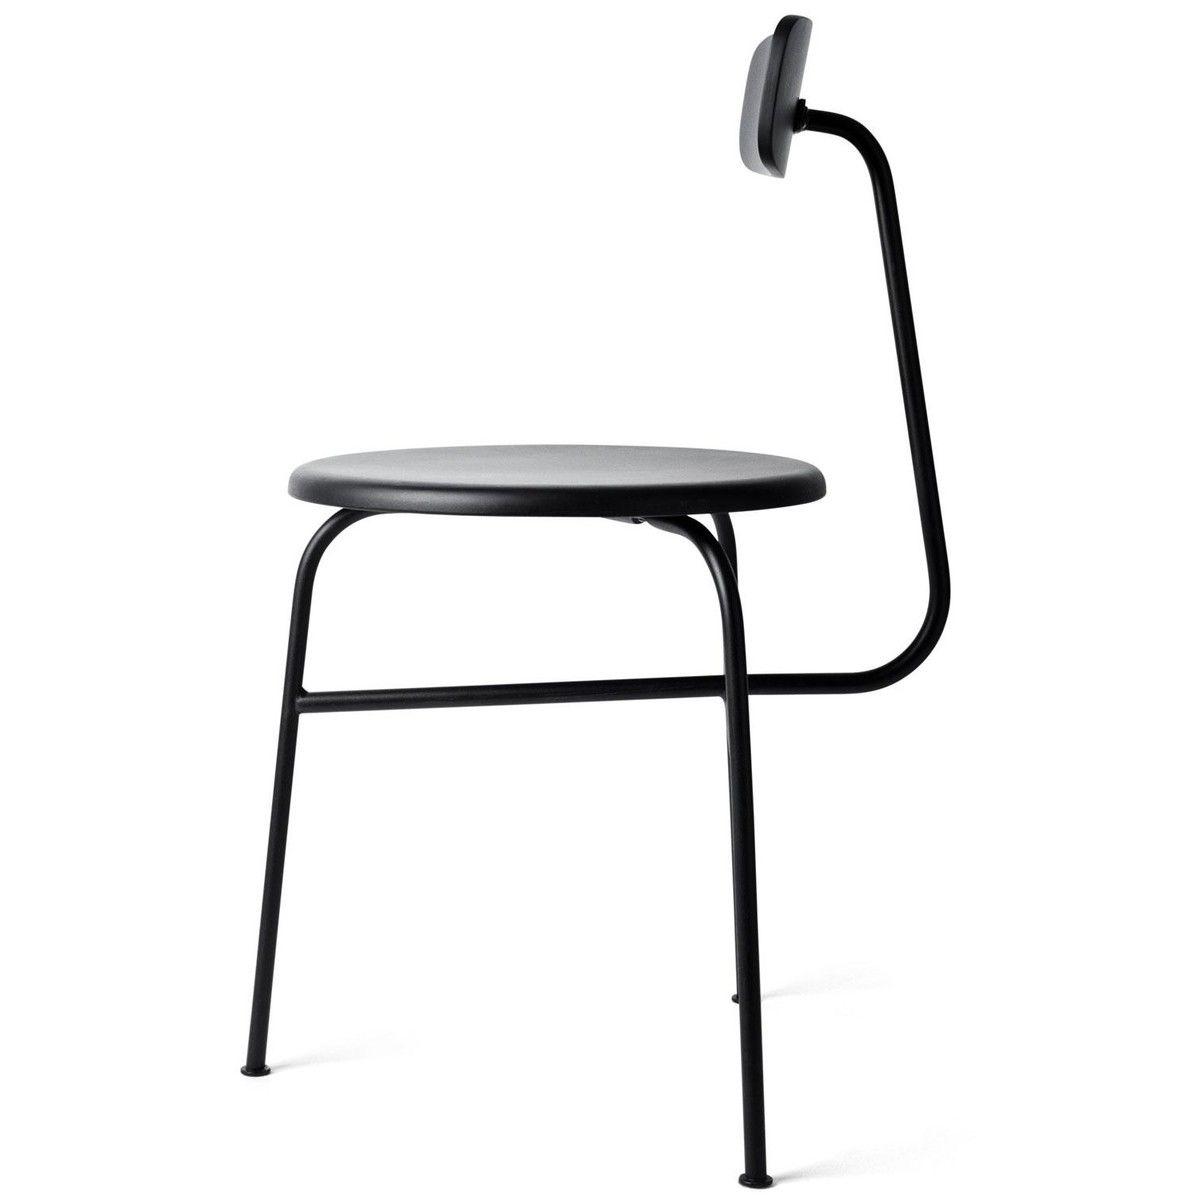 Menu - Menu Furniture Afteroom Chair - Chaise